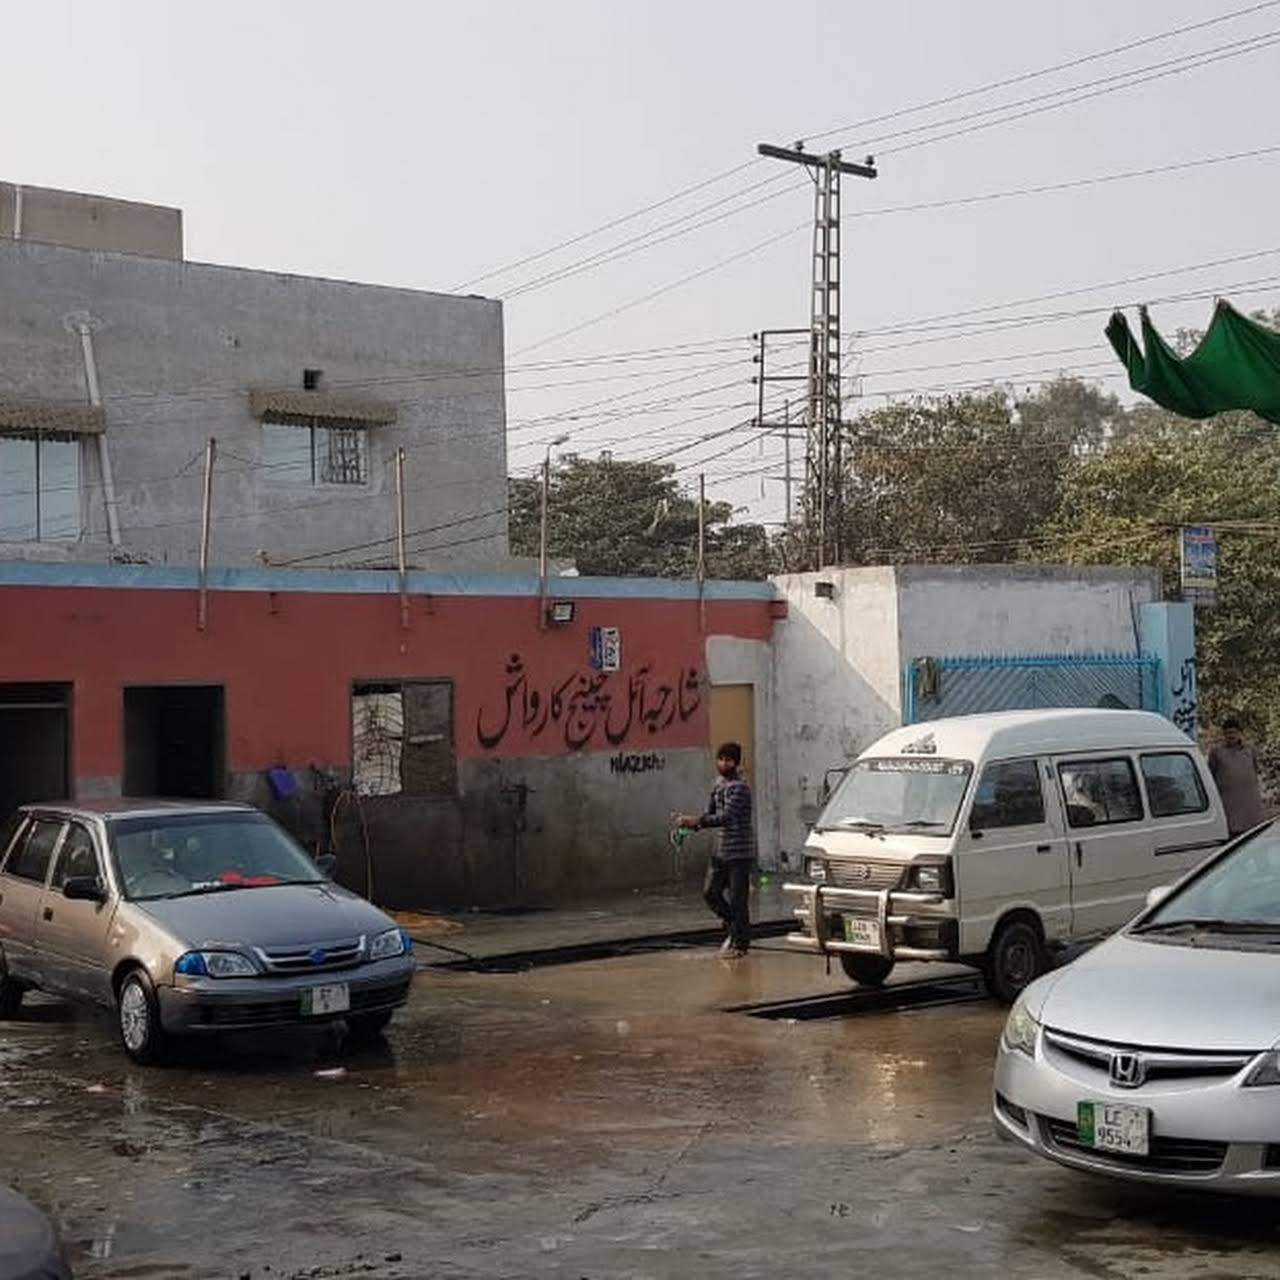 Sharjah Rent A Car & Oil Change - Rent A Car in Harbanspura